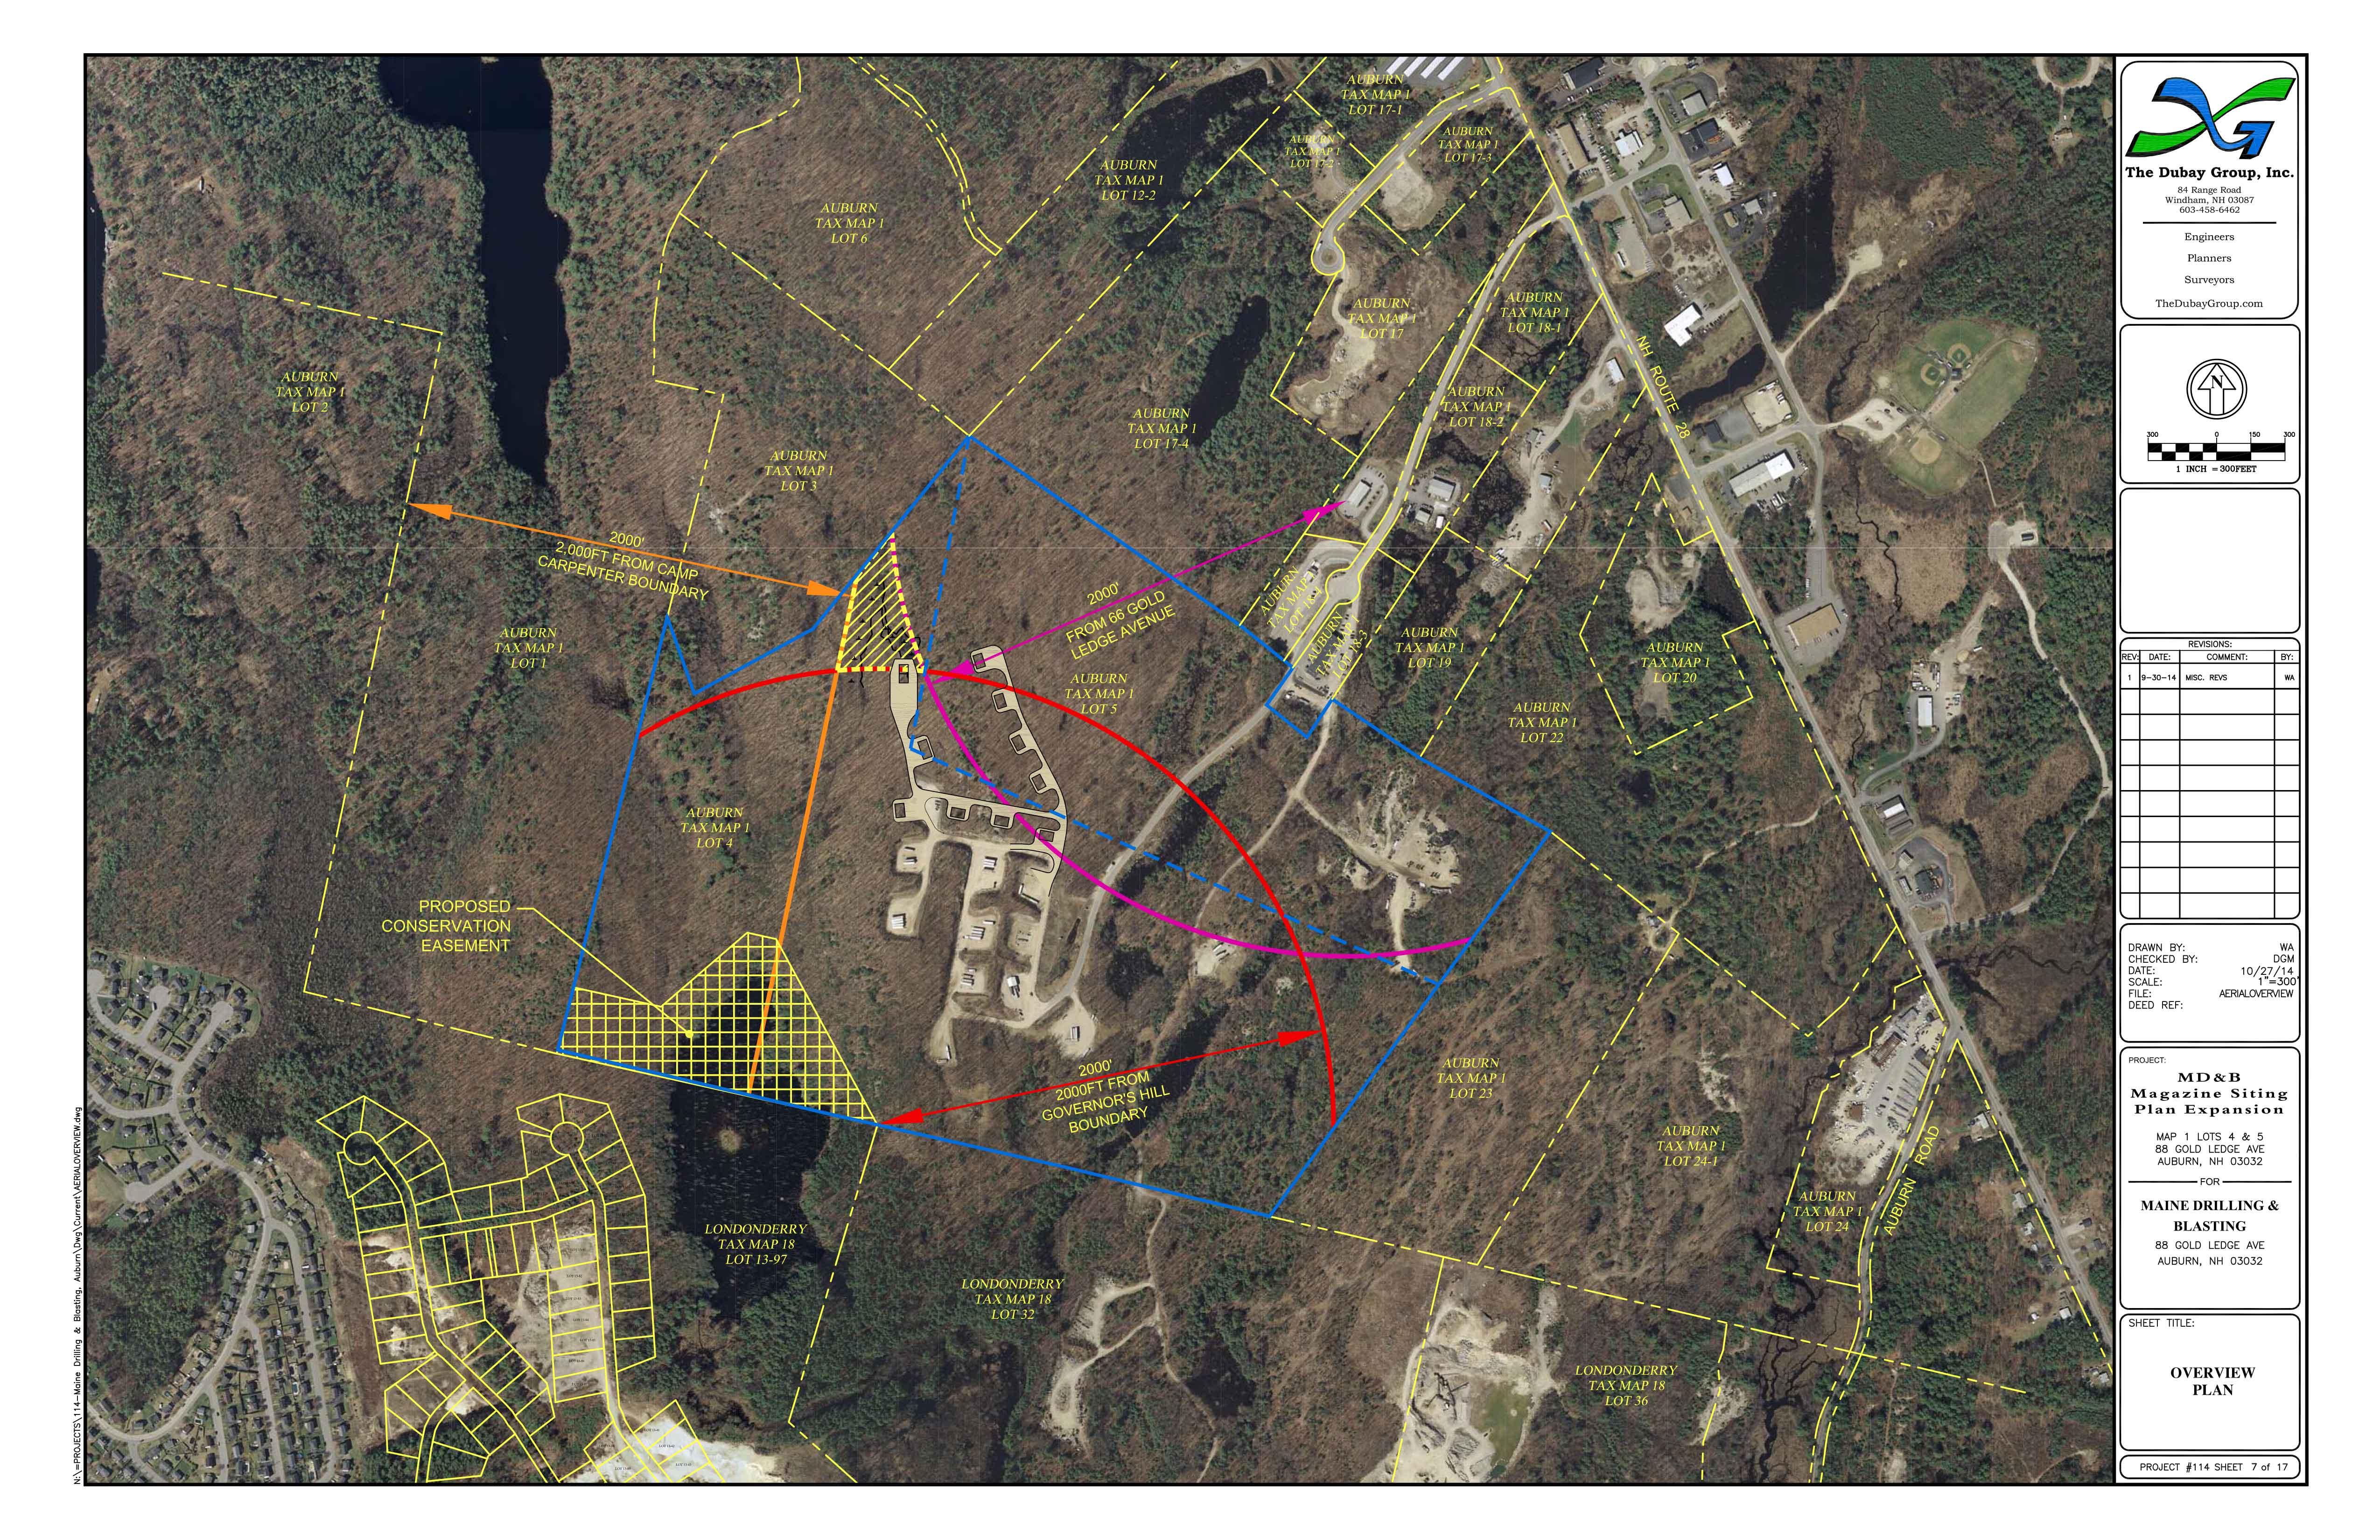 Maine Drilling & Blasting Auburn, NH